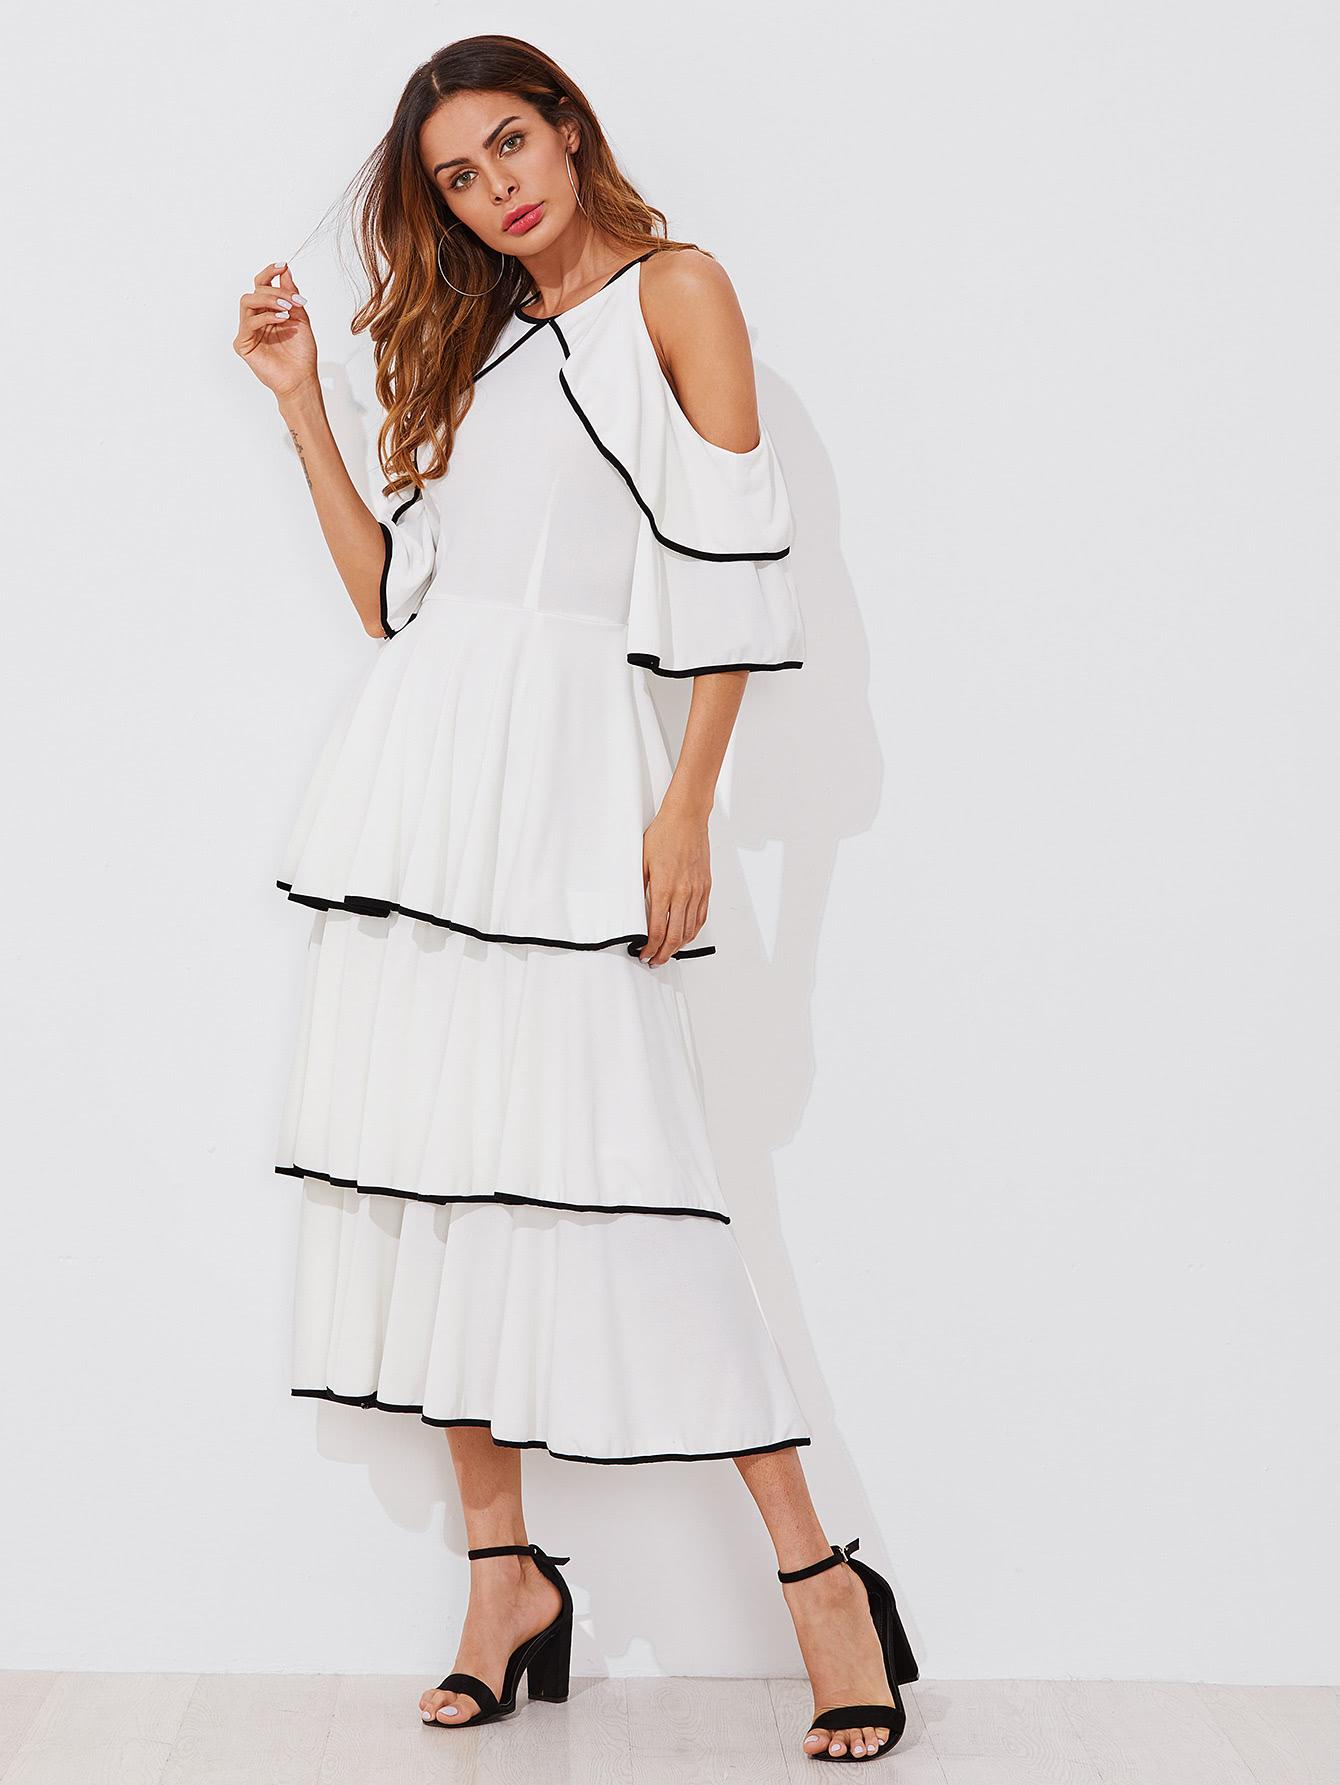 1c2b669f1fb293 Schulterfreies Kleid mit schößchem Saum | ROMWE